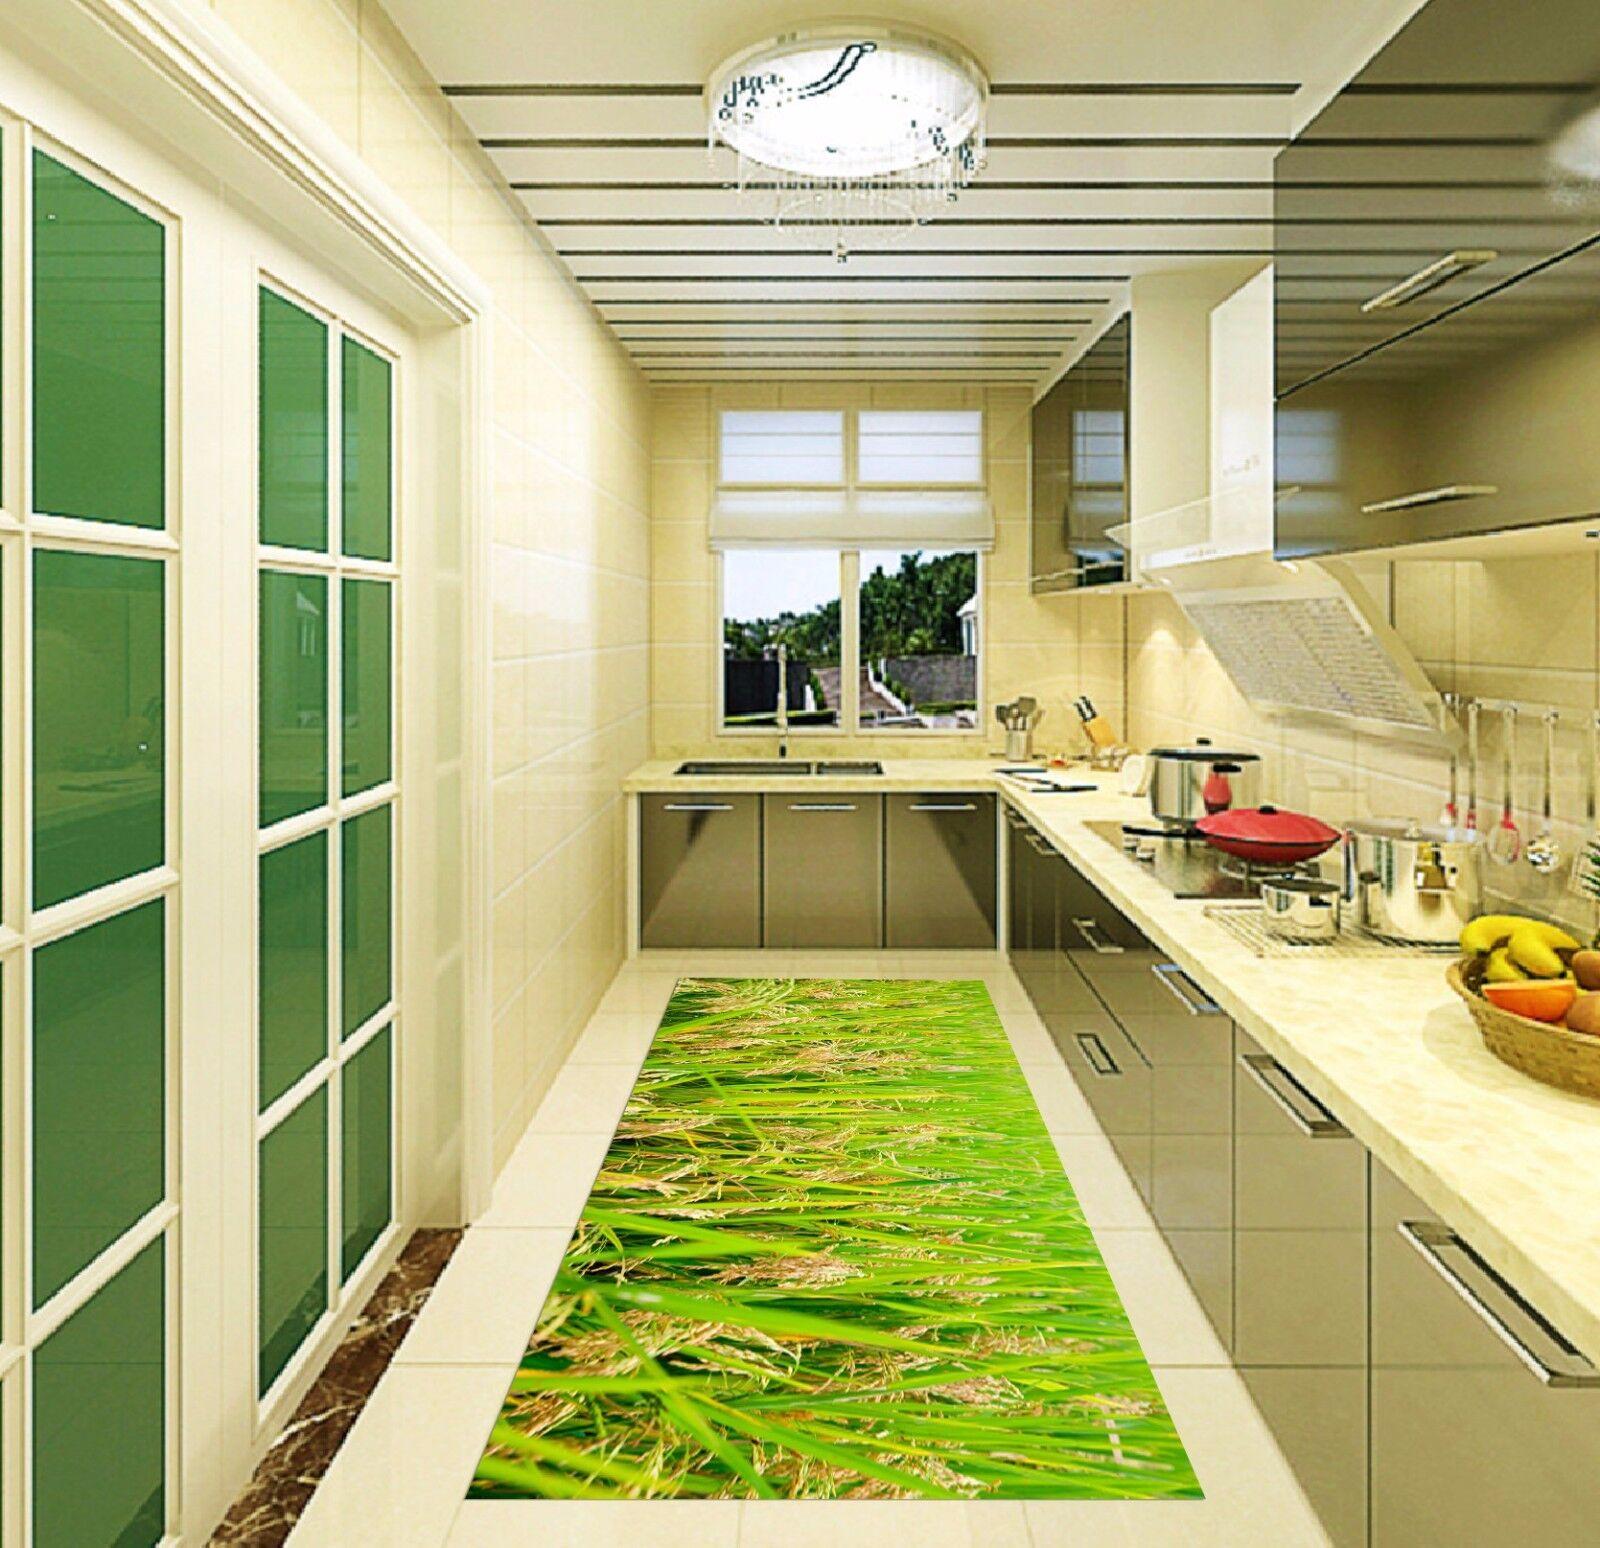 3D Grün Straw 822 Kitchen Mat Floor Murals Wall Print Wall AJ WALLPAPER UK Kyra